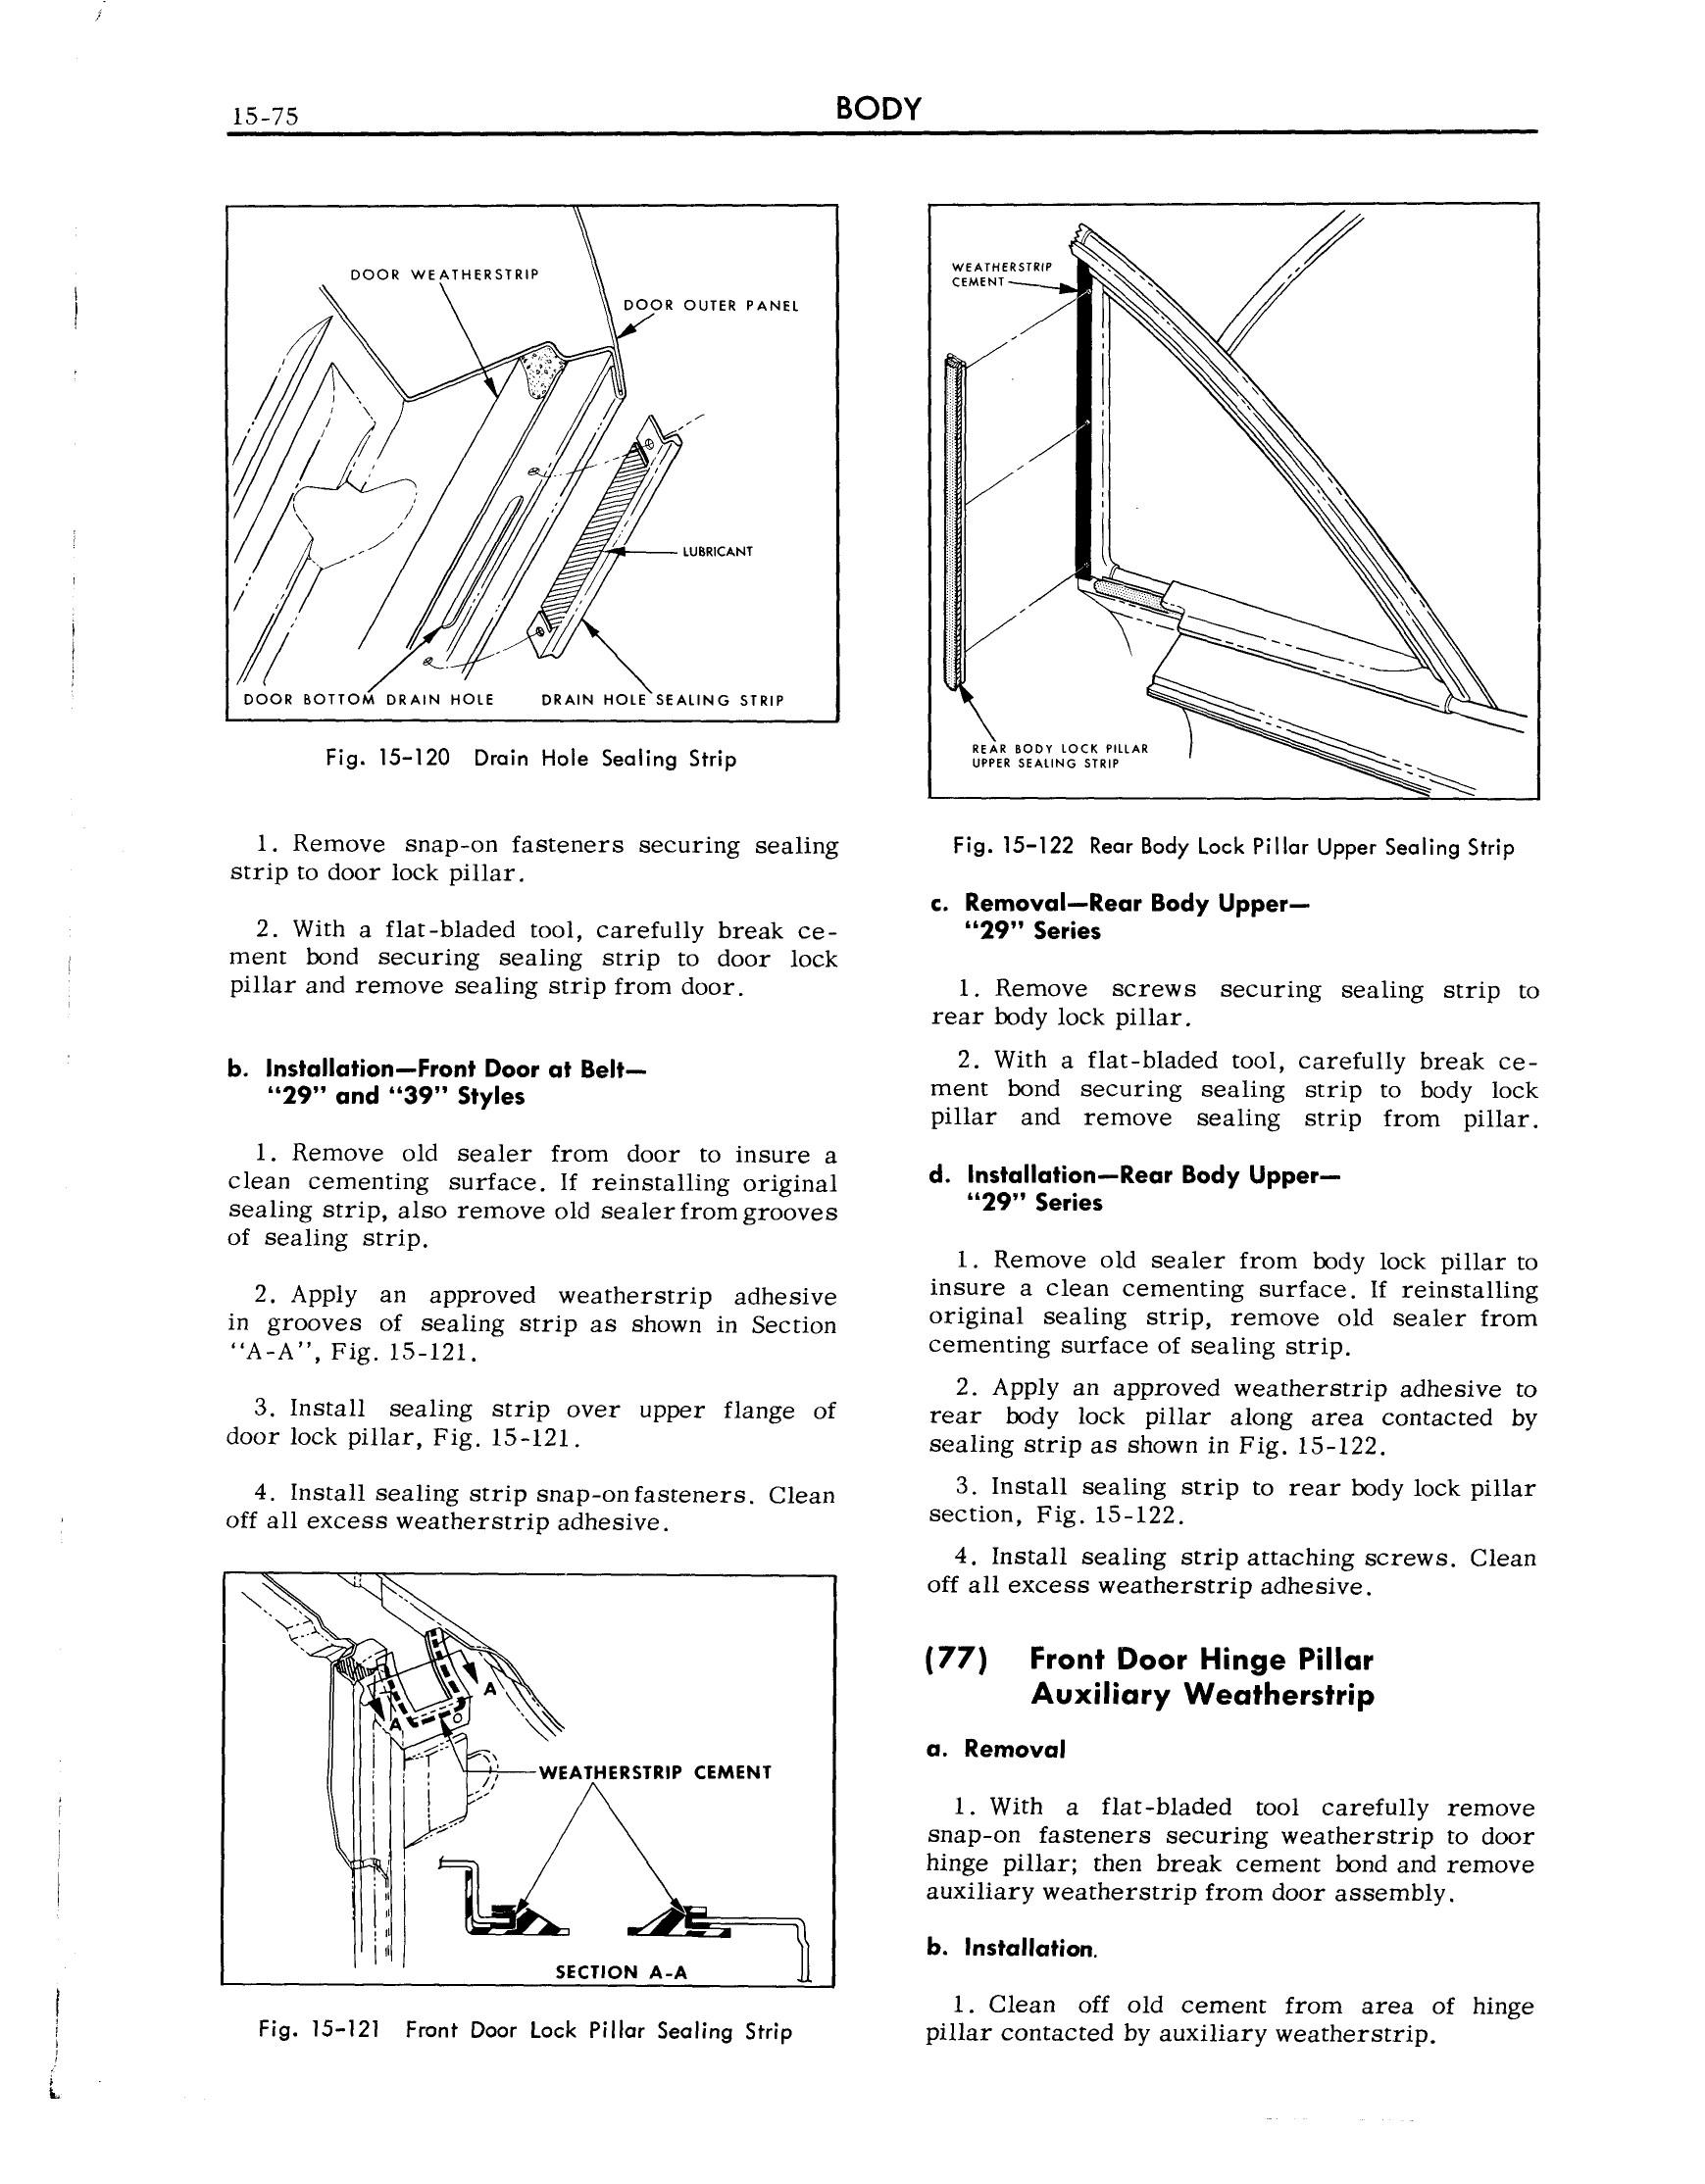 1959 Cadillac Shop Manual- Body Page 75 of 99